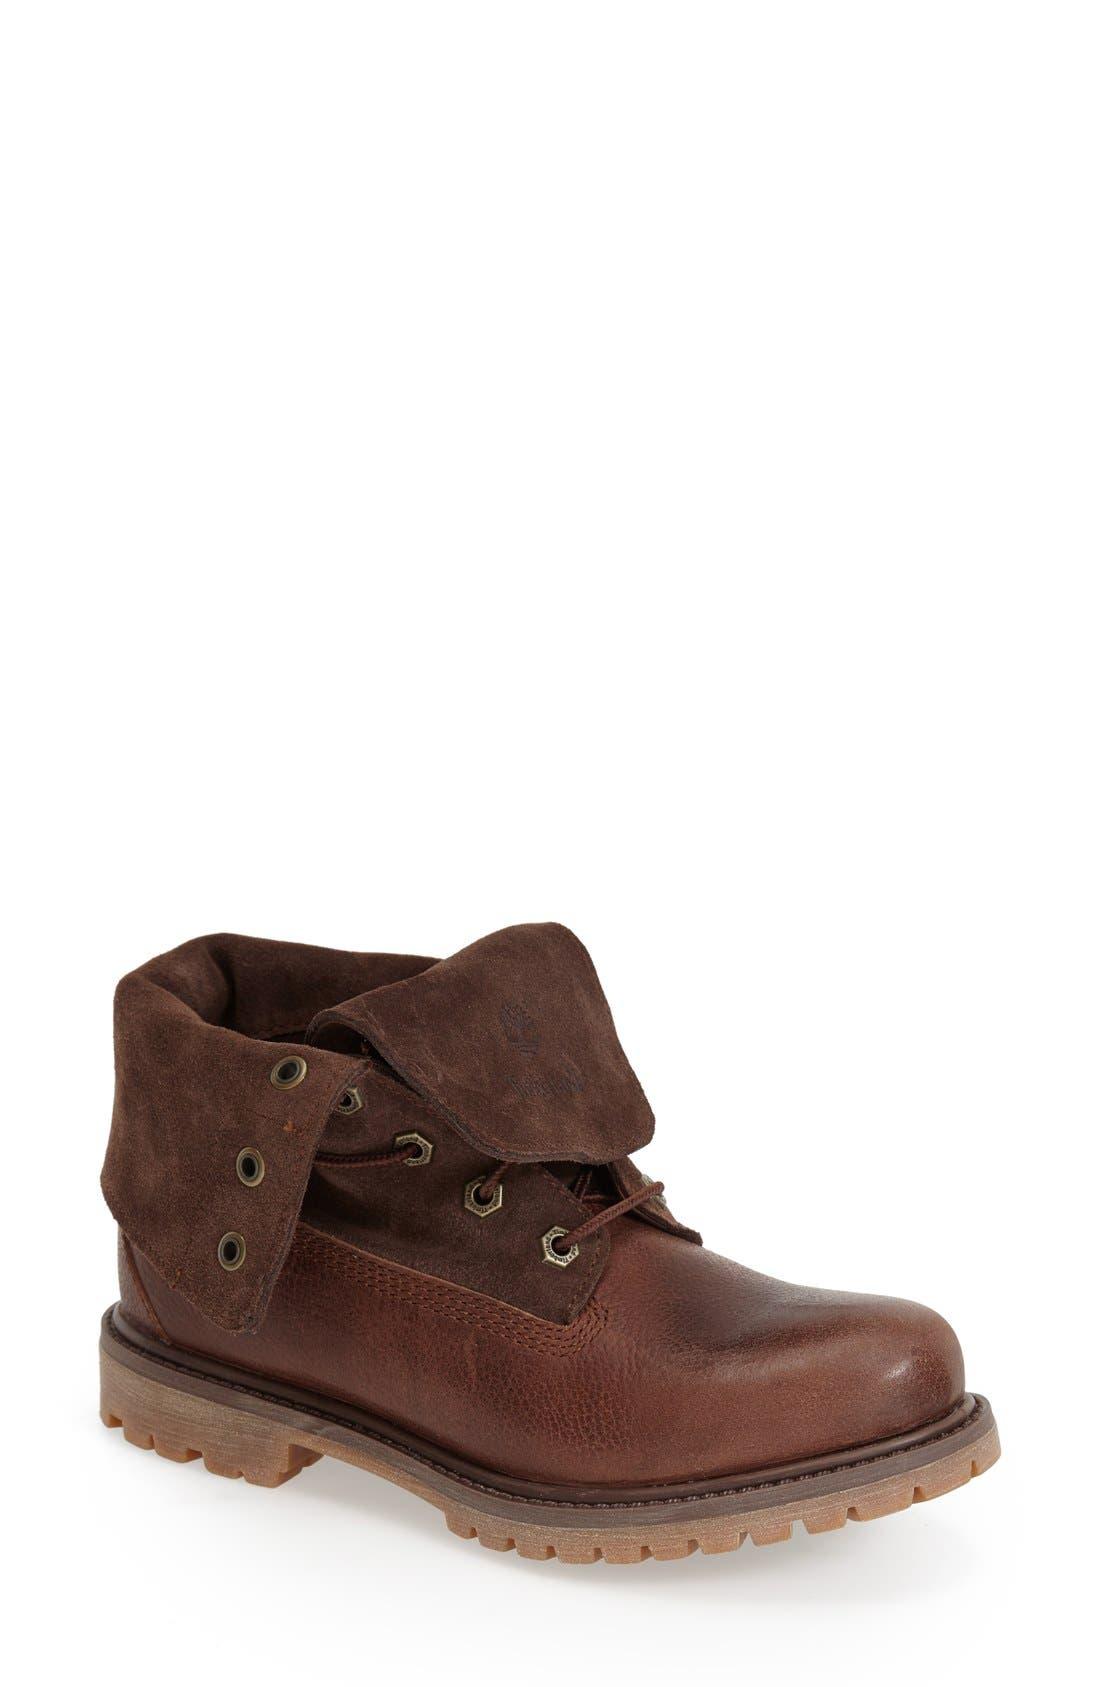 Main Image - Timberland Waterproof Leather Boot (Women)